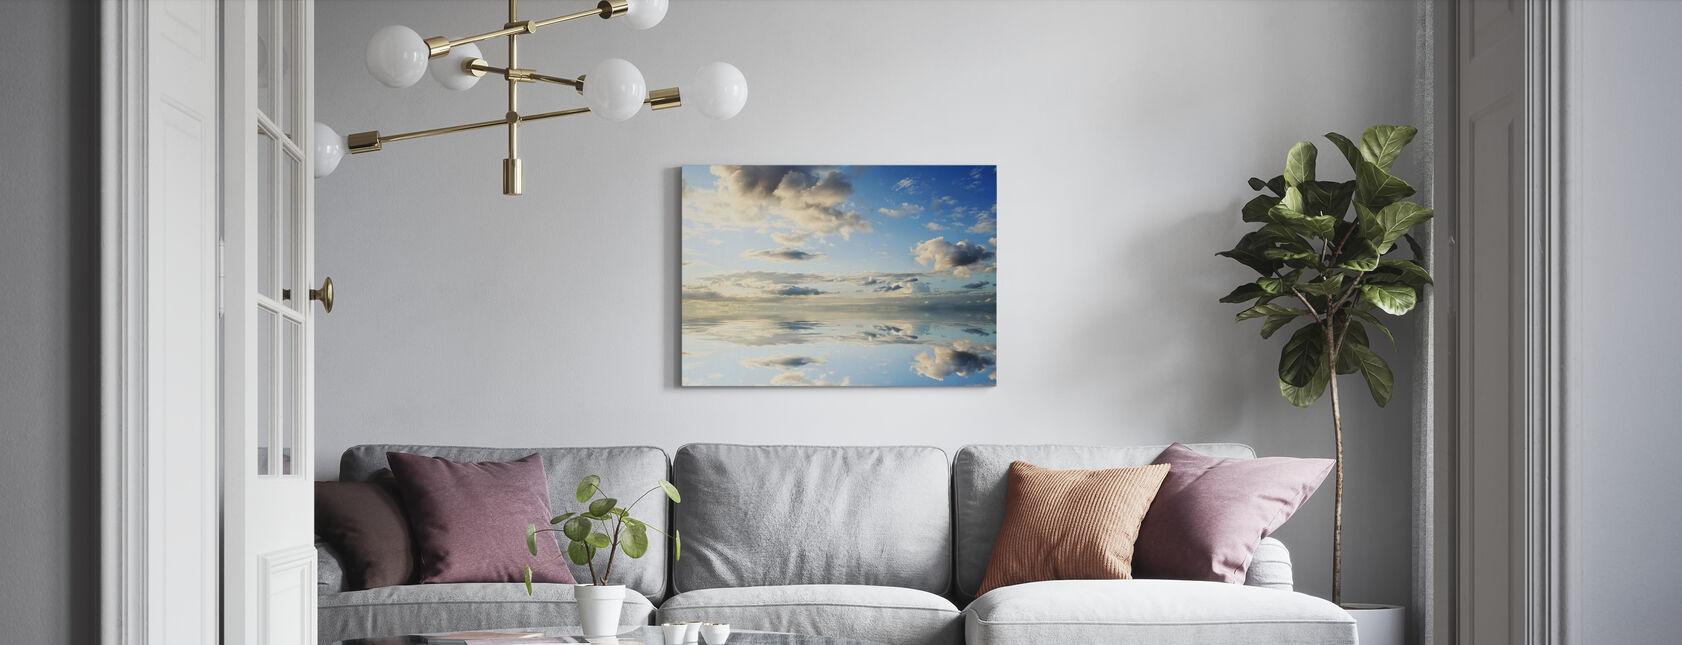 Sea and Beautiful Sky - Canvas print - Living Room